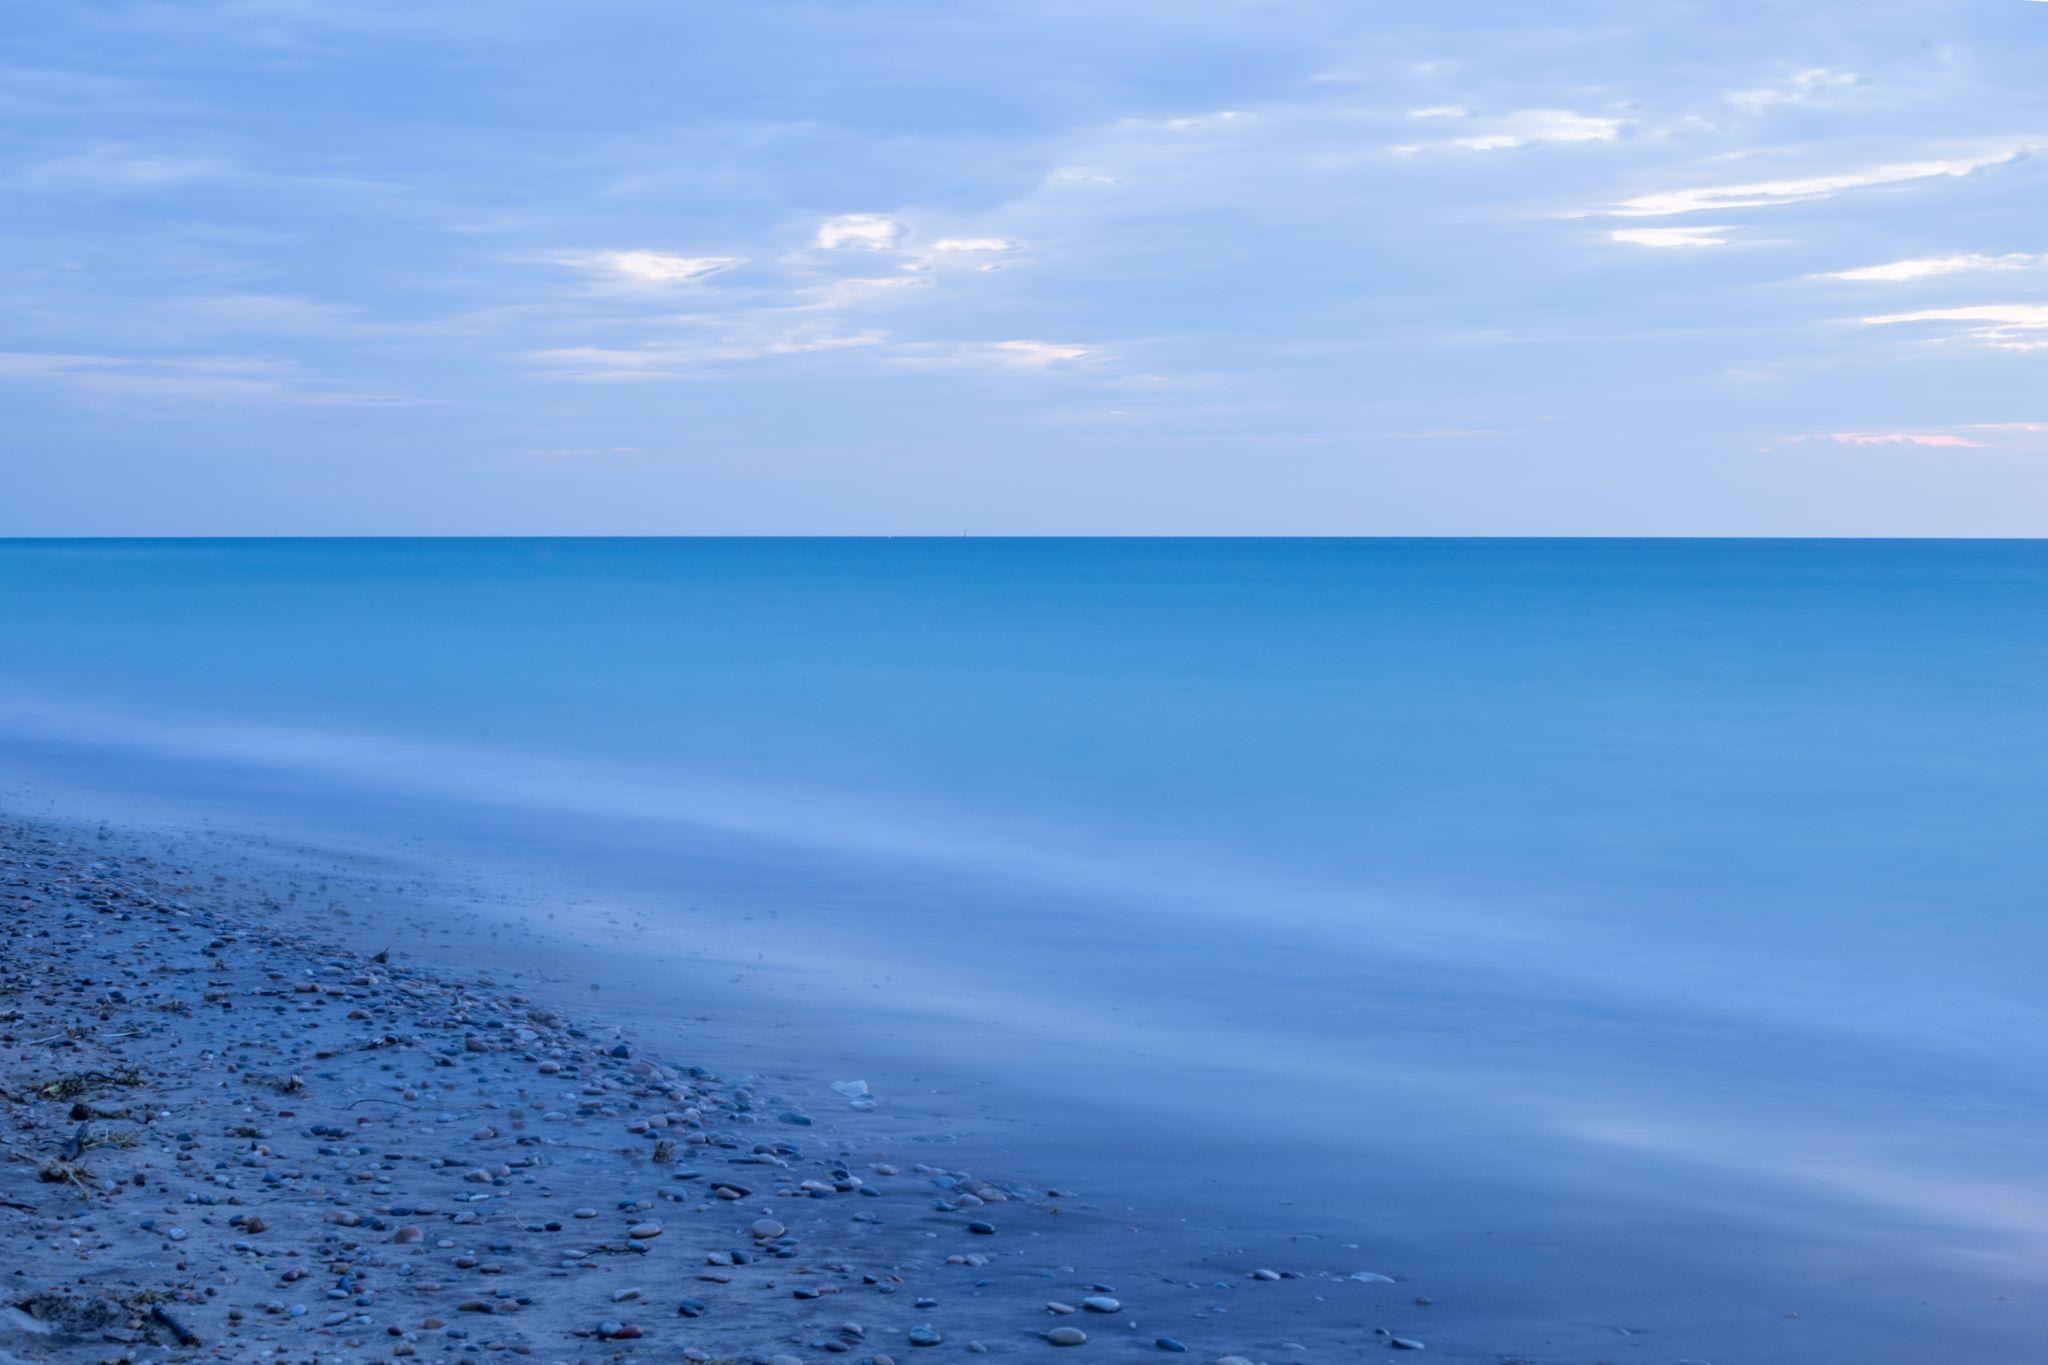 Illinois Beach State Park, USA